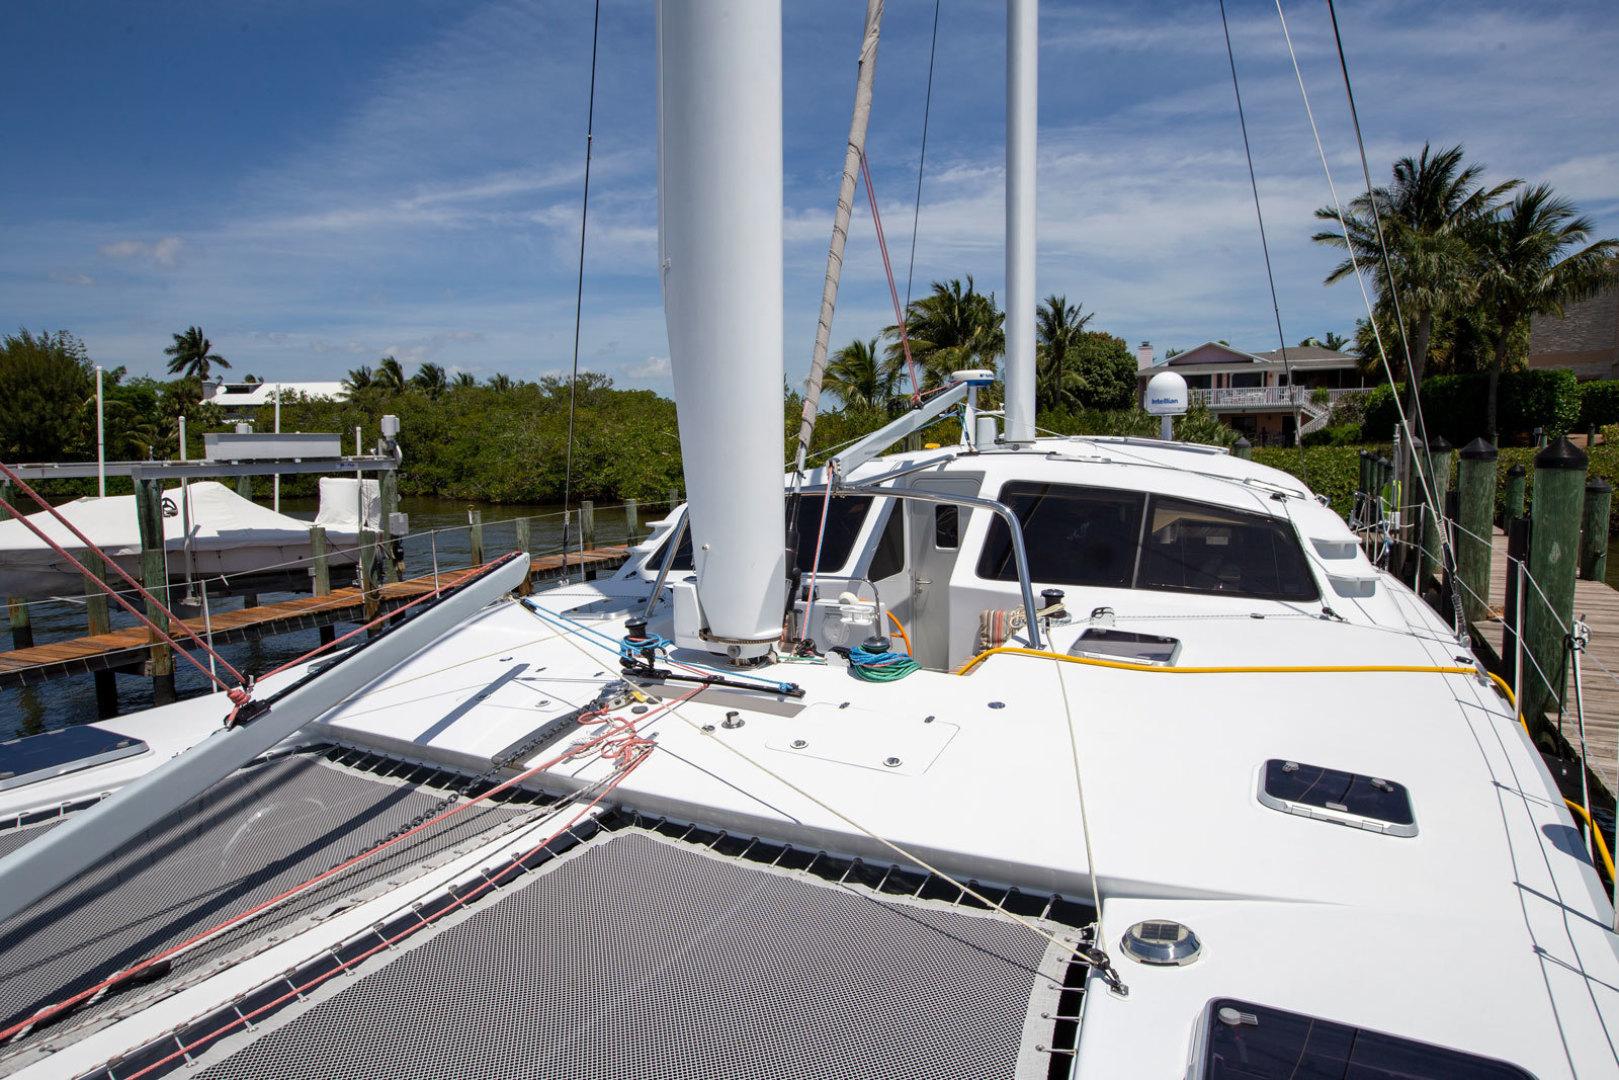 Atlantic-49 Catamaran 2018-Wabi Sabi Stuart-Florida-United States-1399301 | Thumbnail